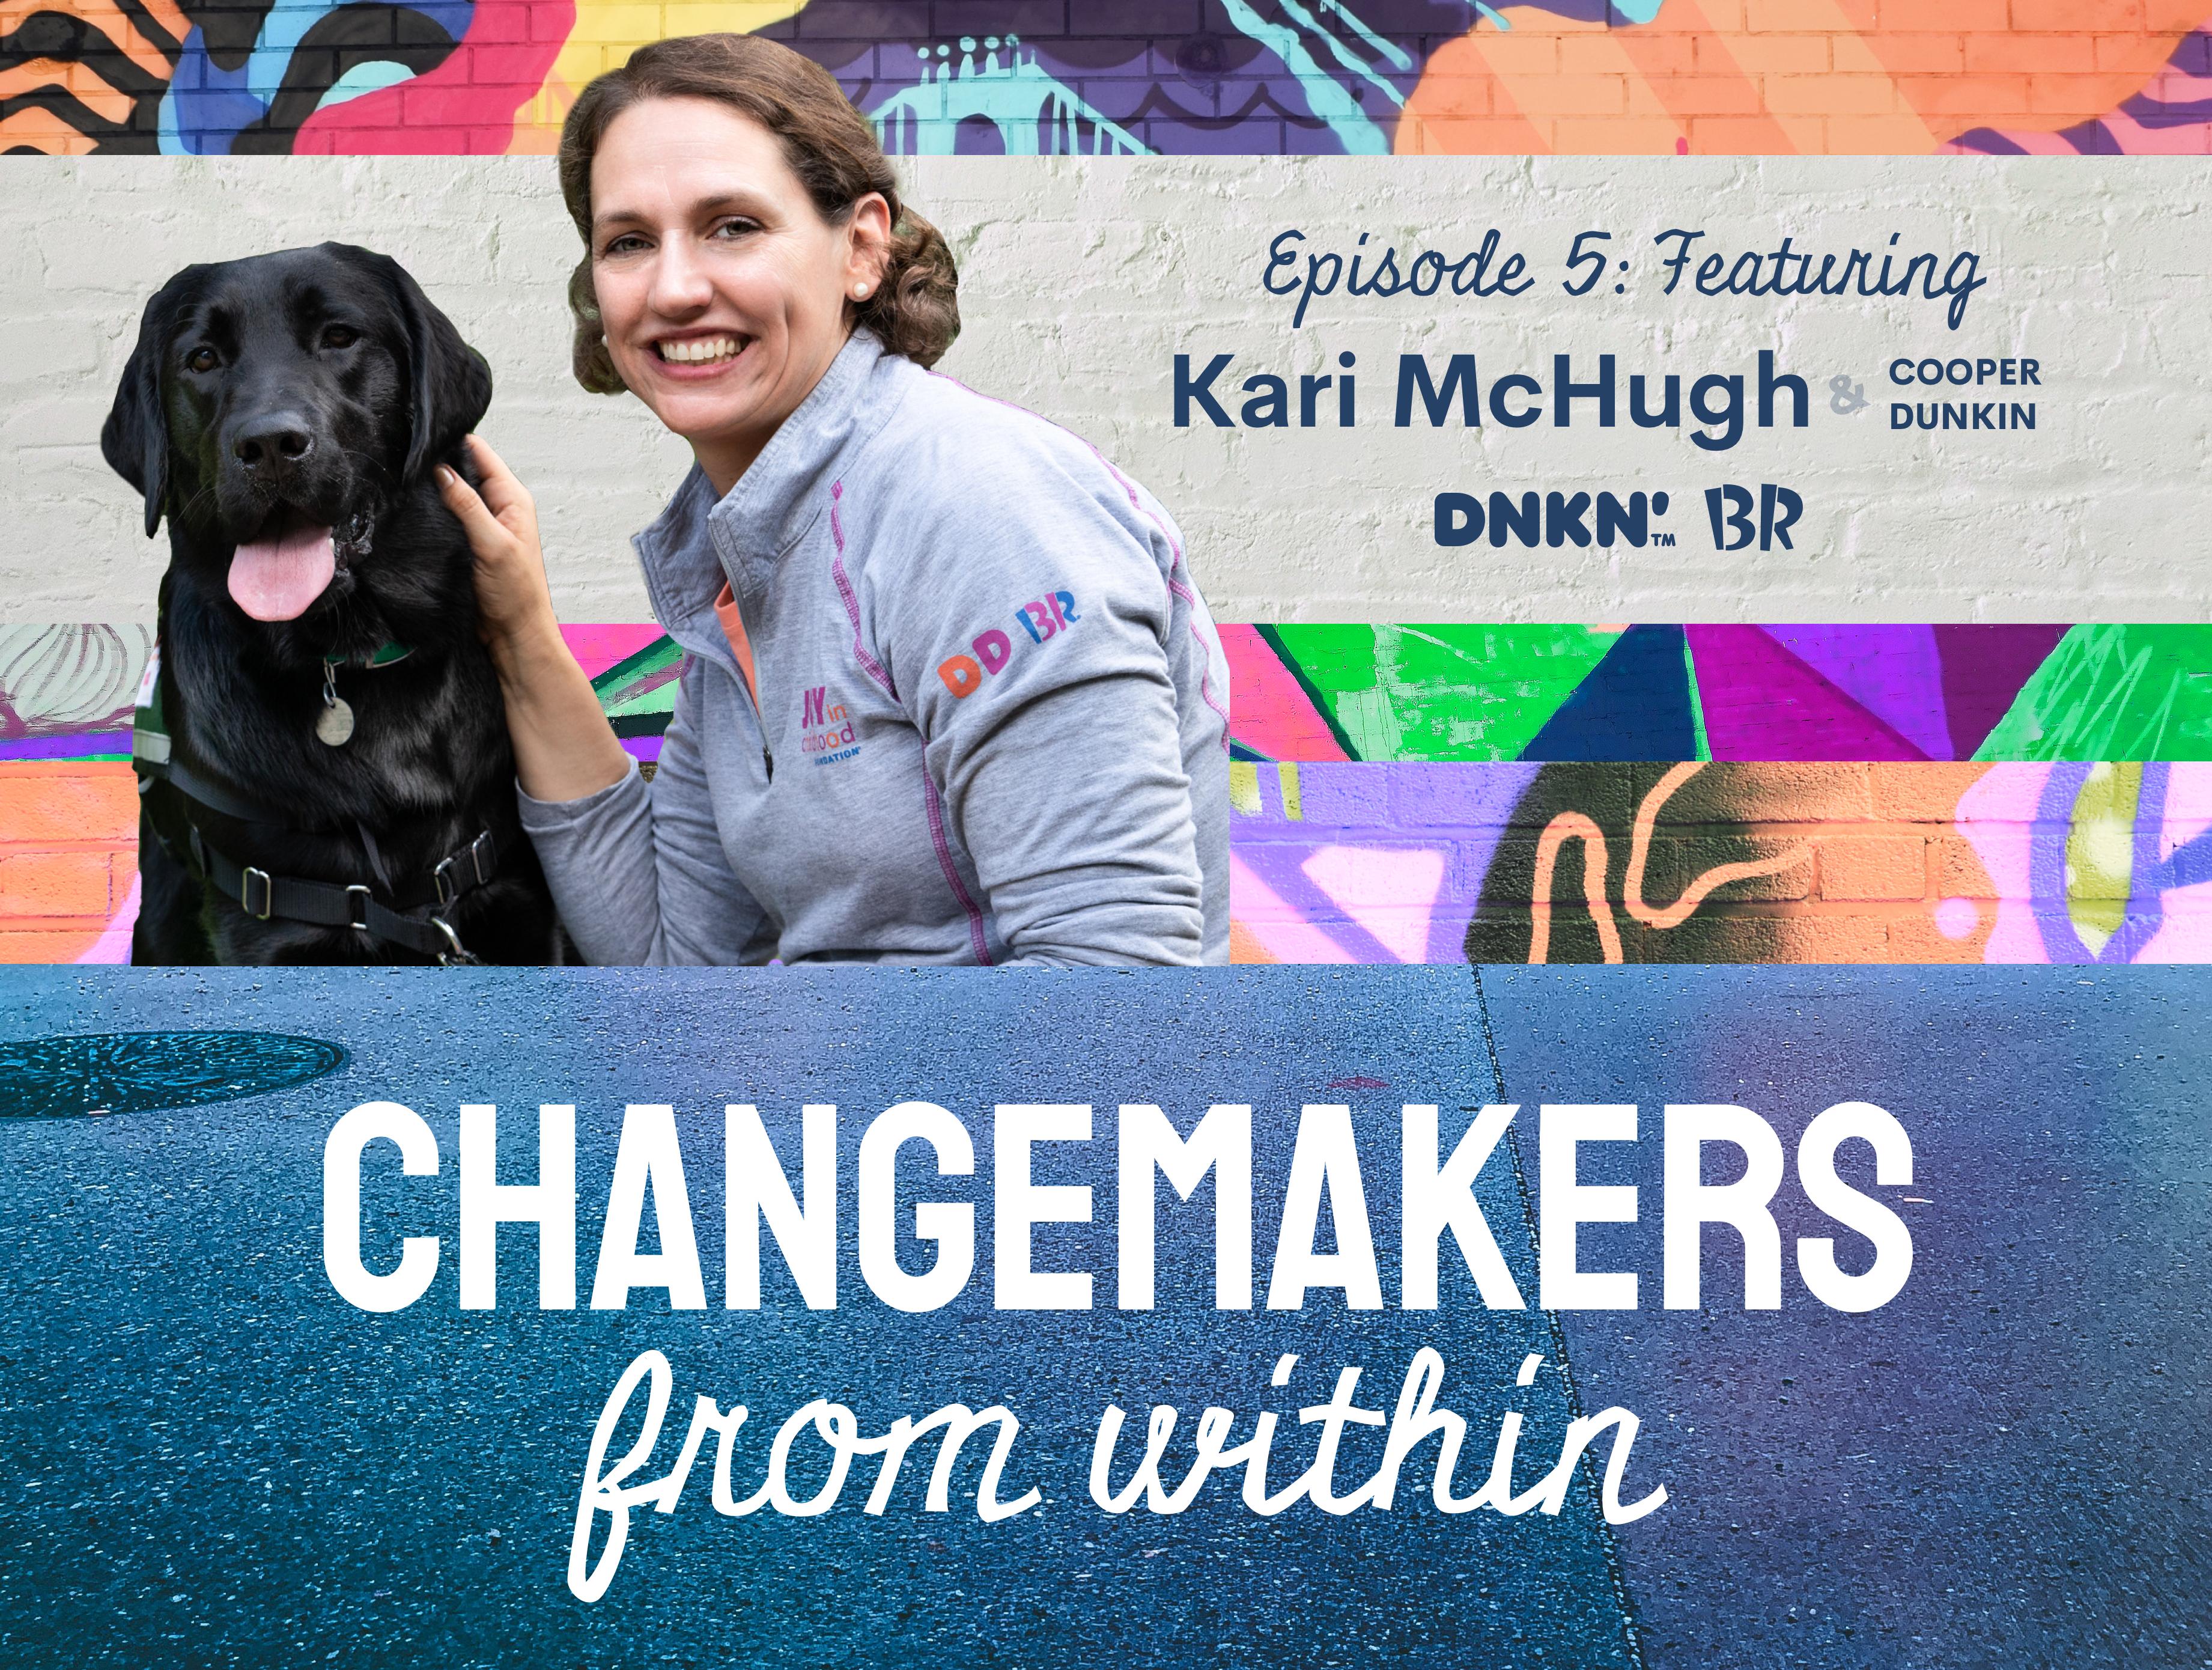 changemakers from within - kari mchugh